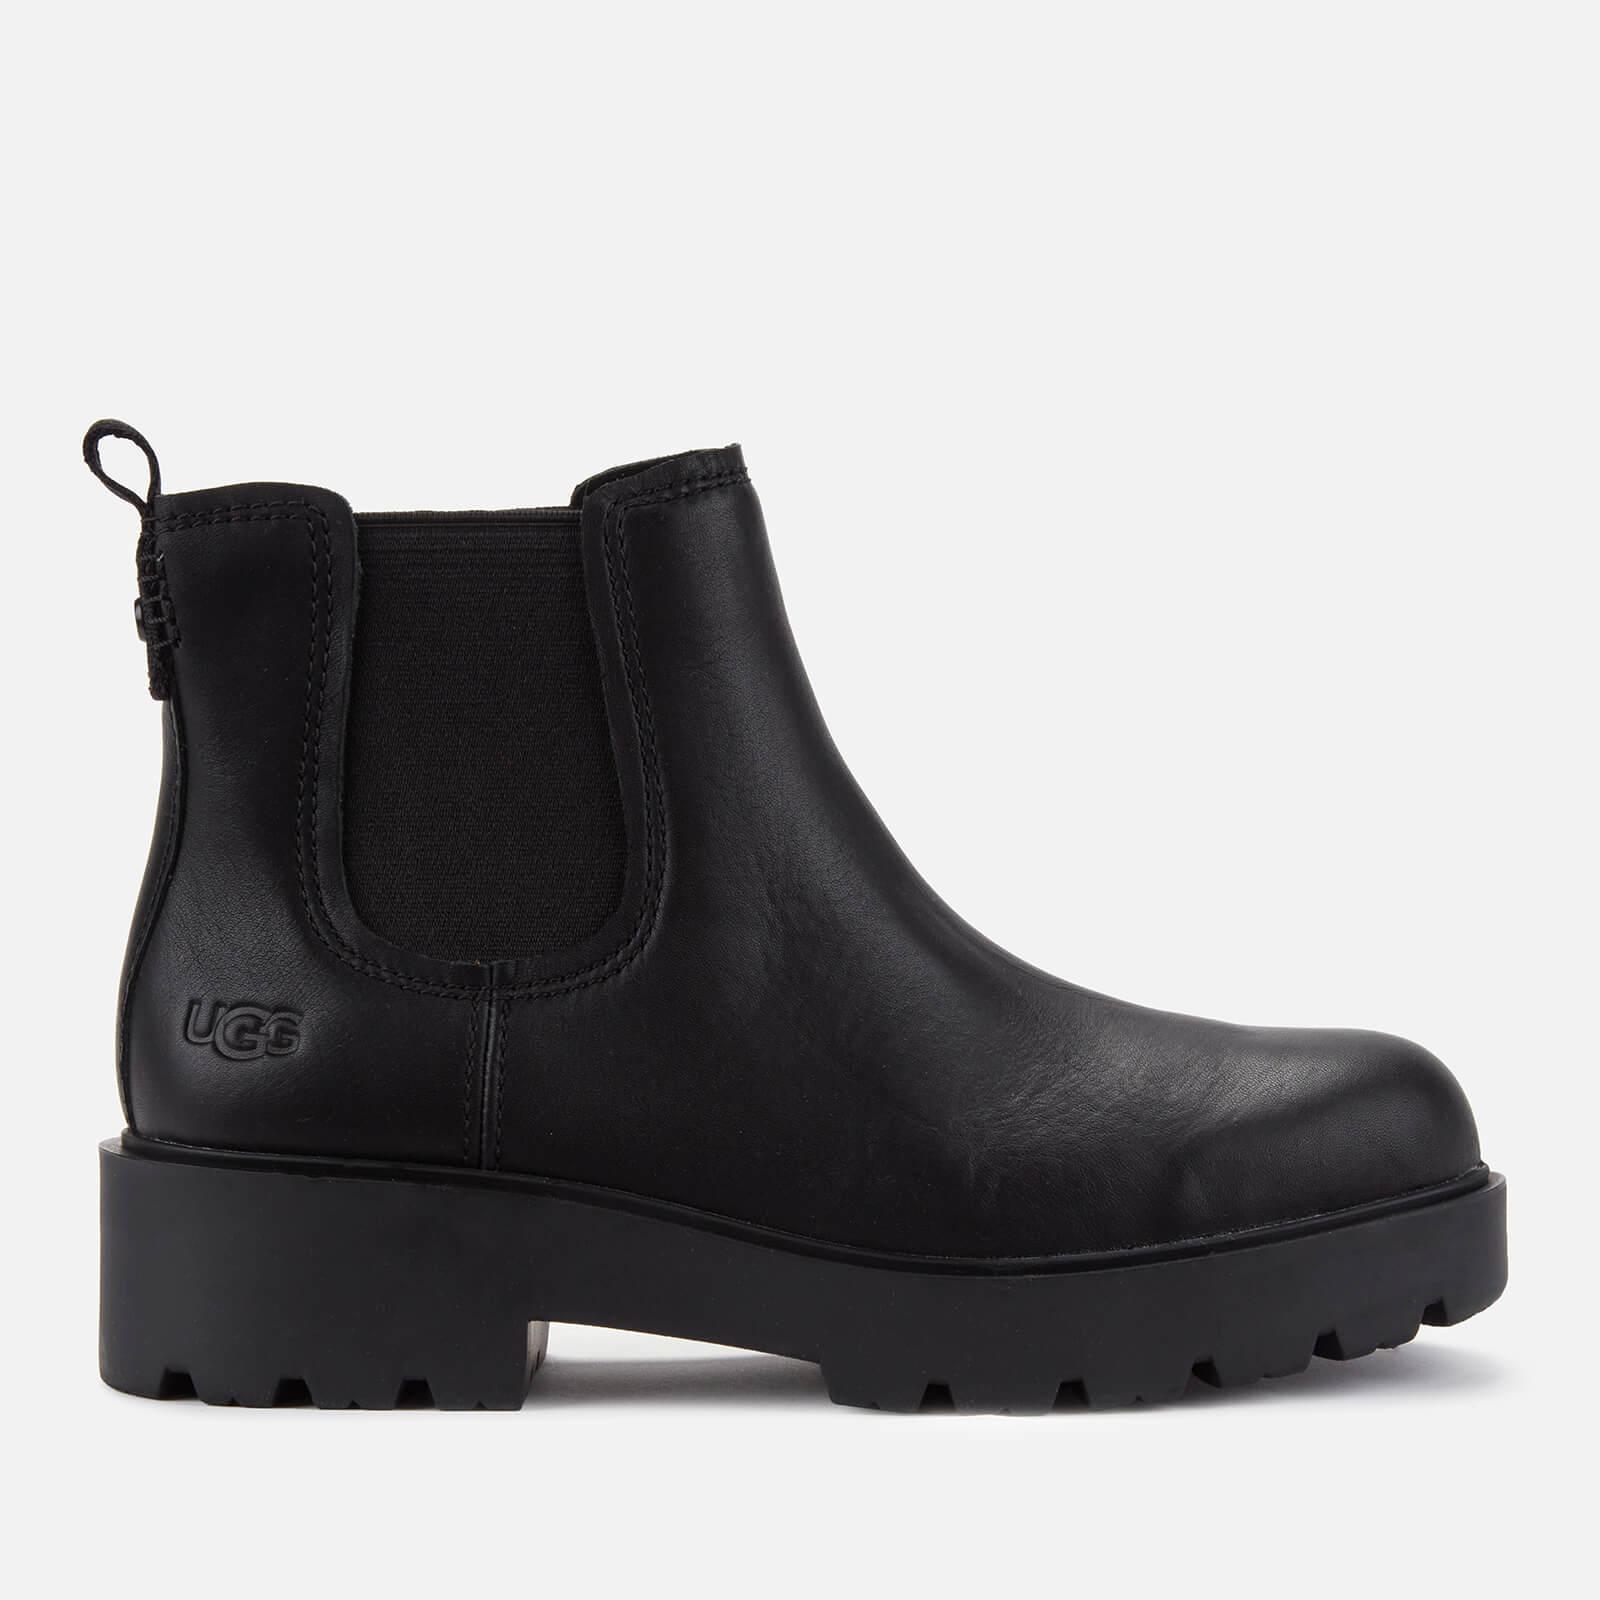 UGG Women's Markstrum Waterproof Leather Chelsea Boots - Black - UK 4